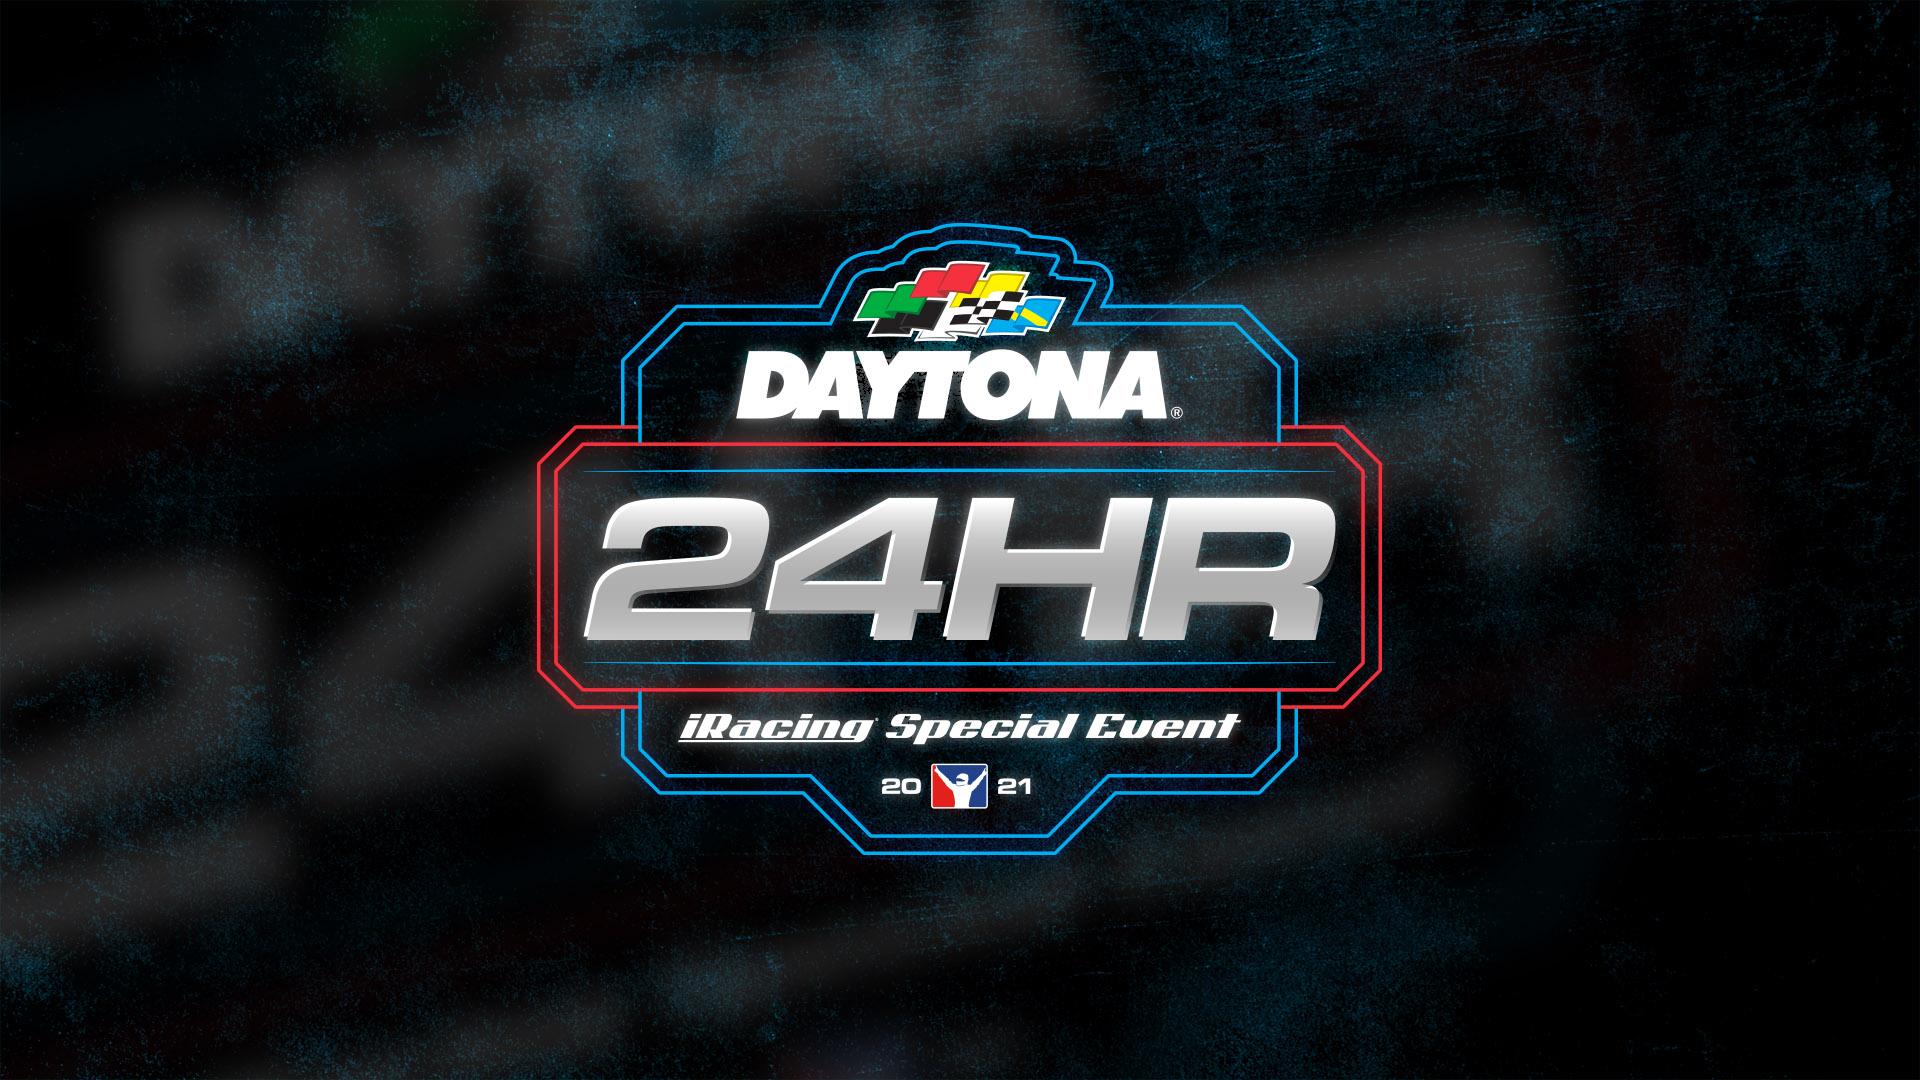 daytona-24hr-feature-1.jpg